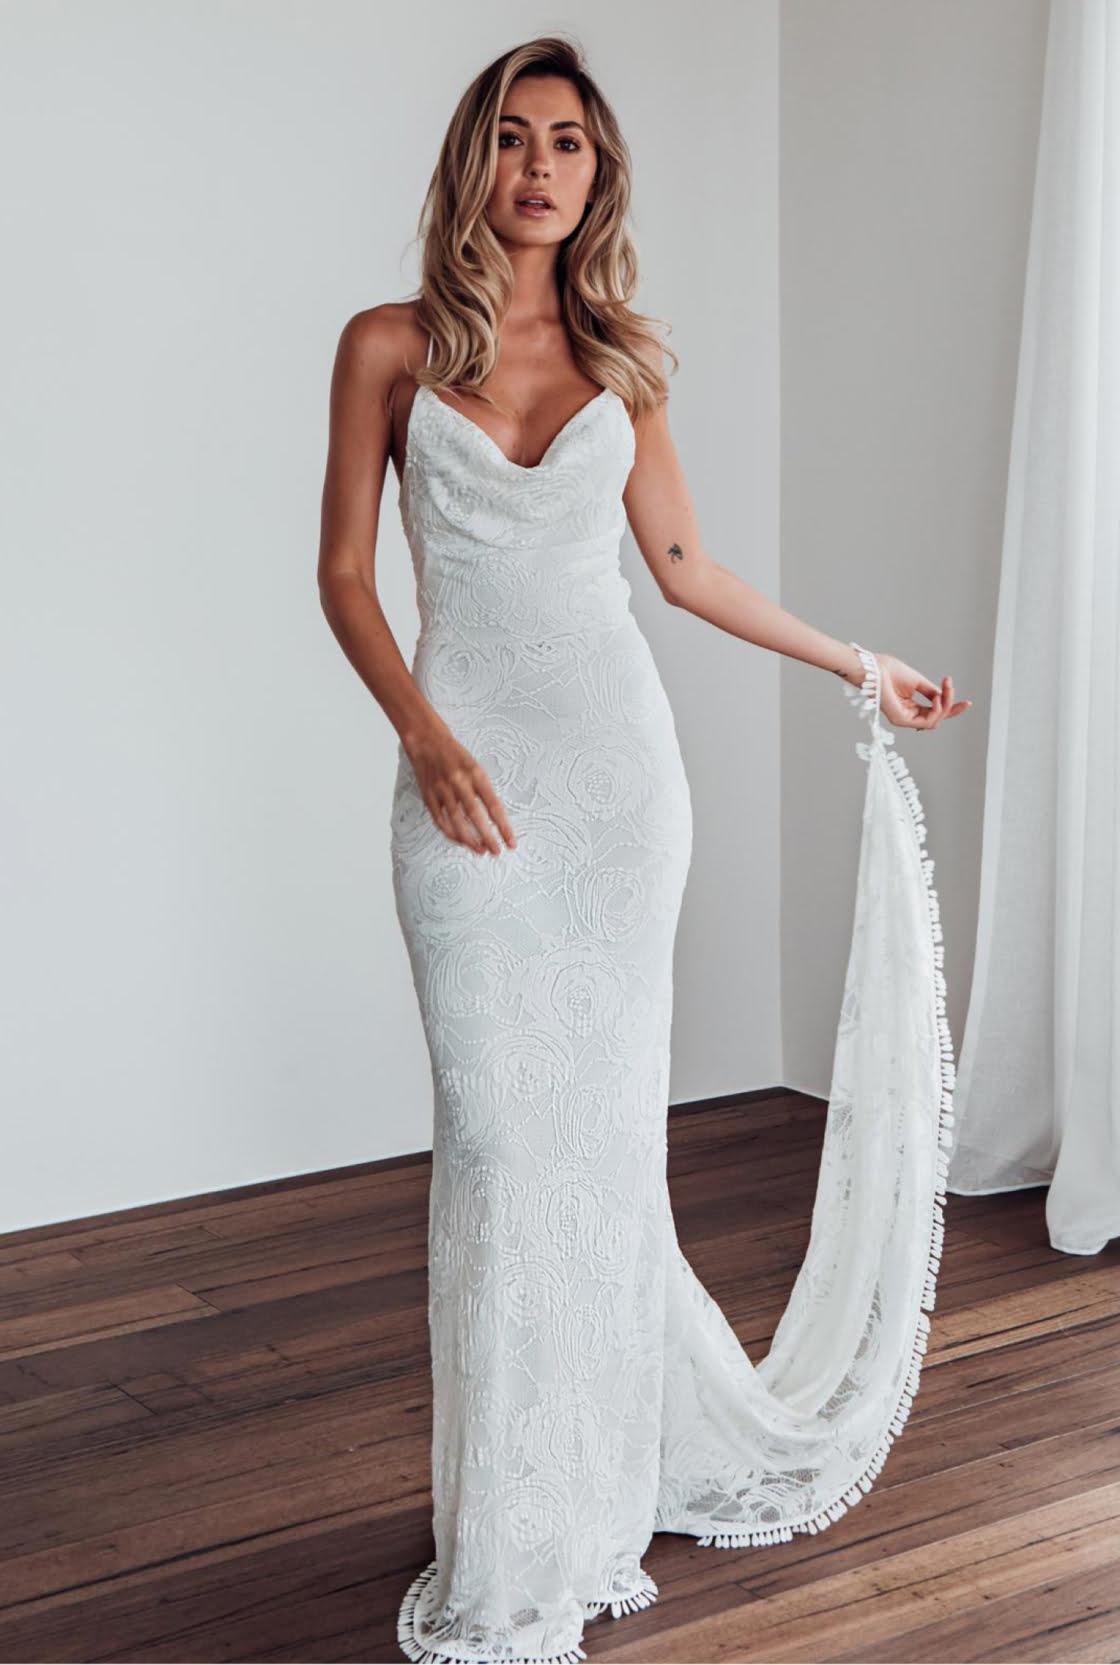 TOP 15 WEDDING DRESSES UNDER $2000 – Hello May